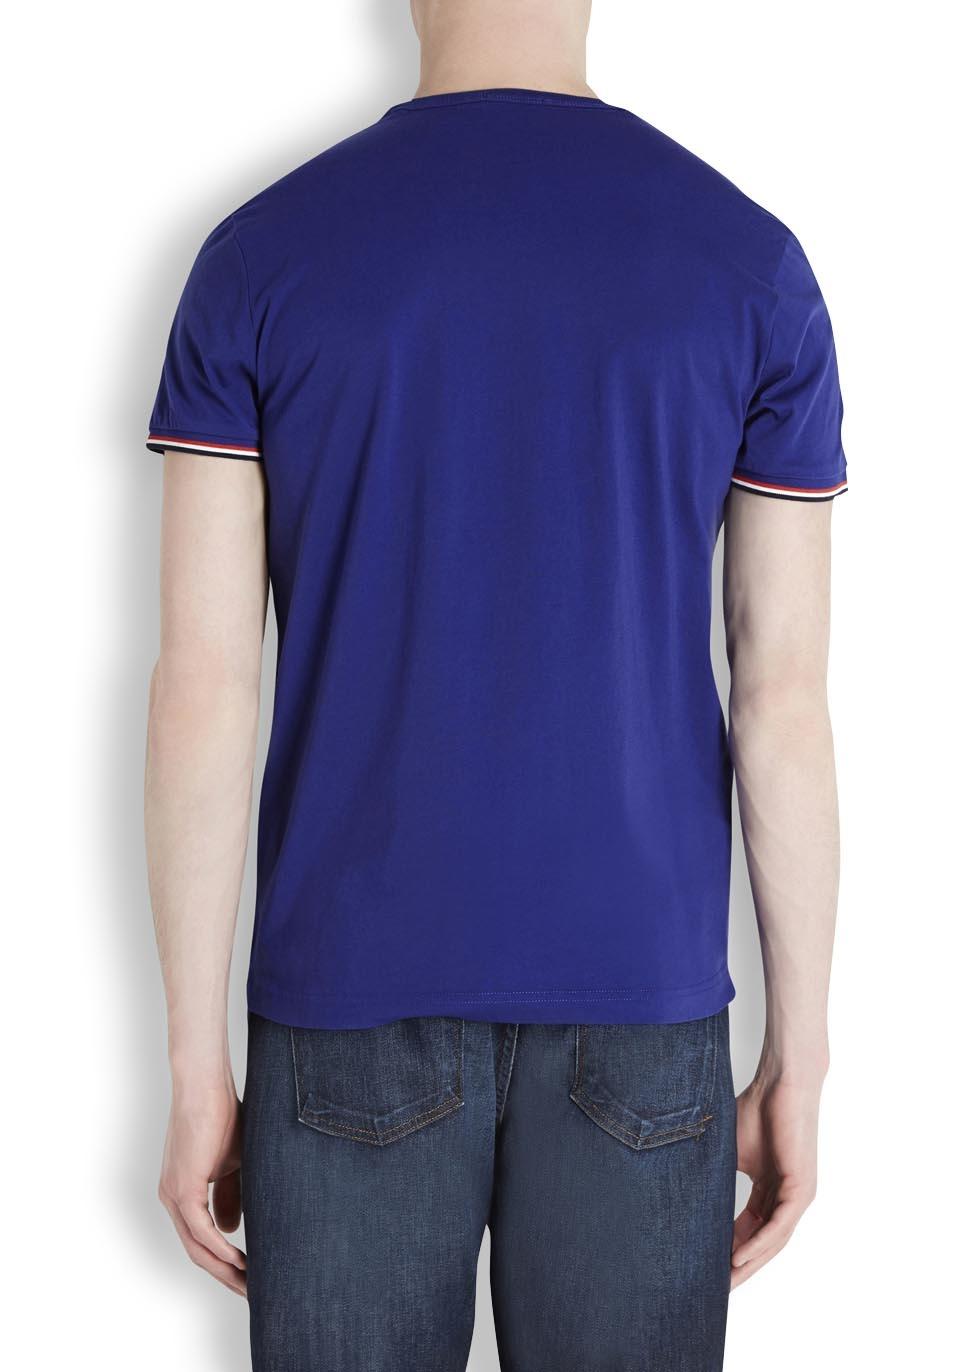 moncler royal blue t shirt